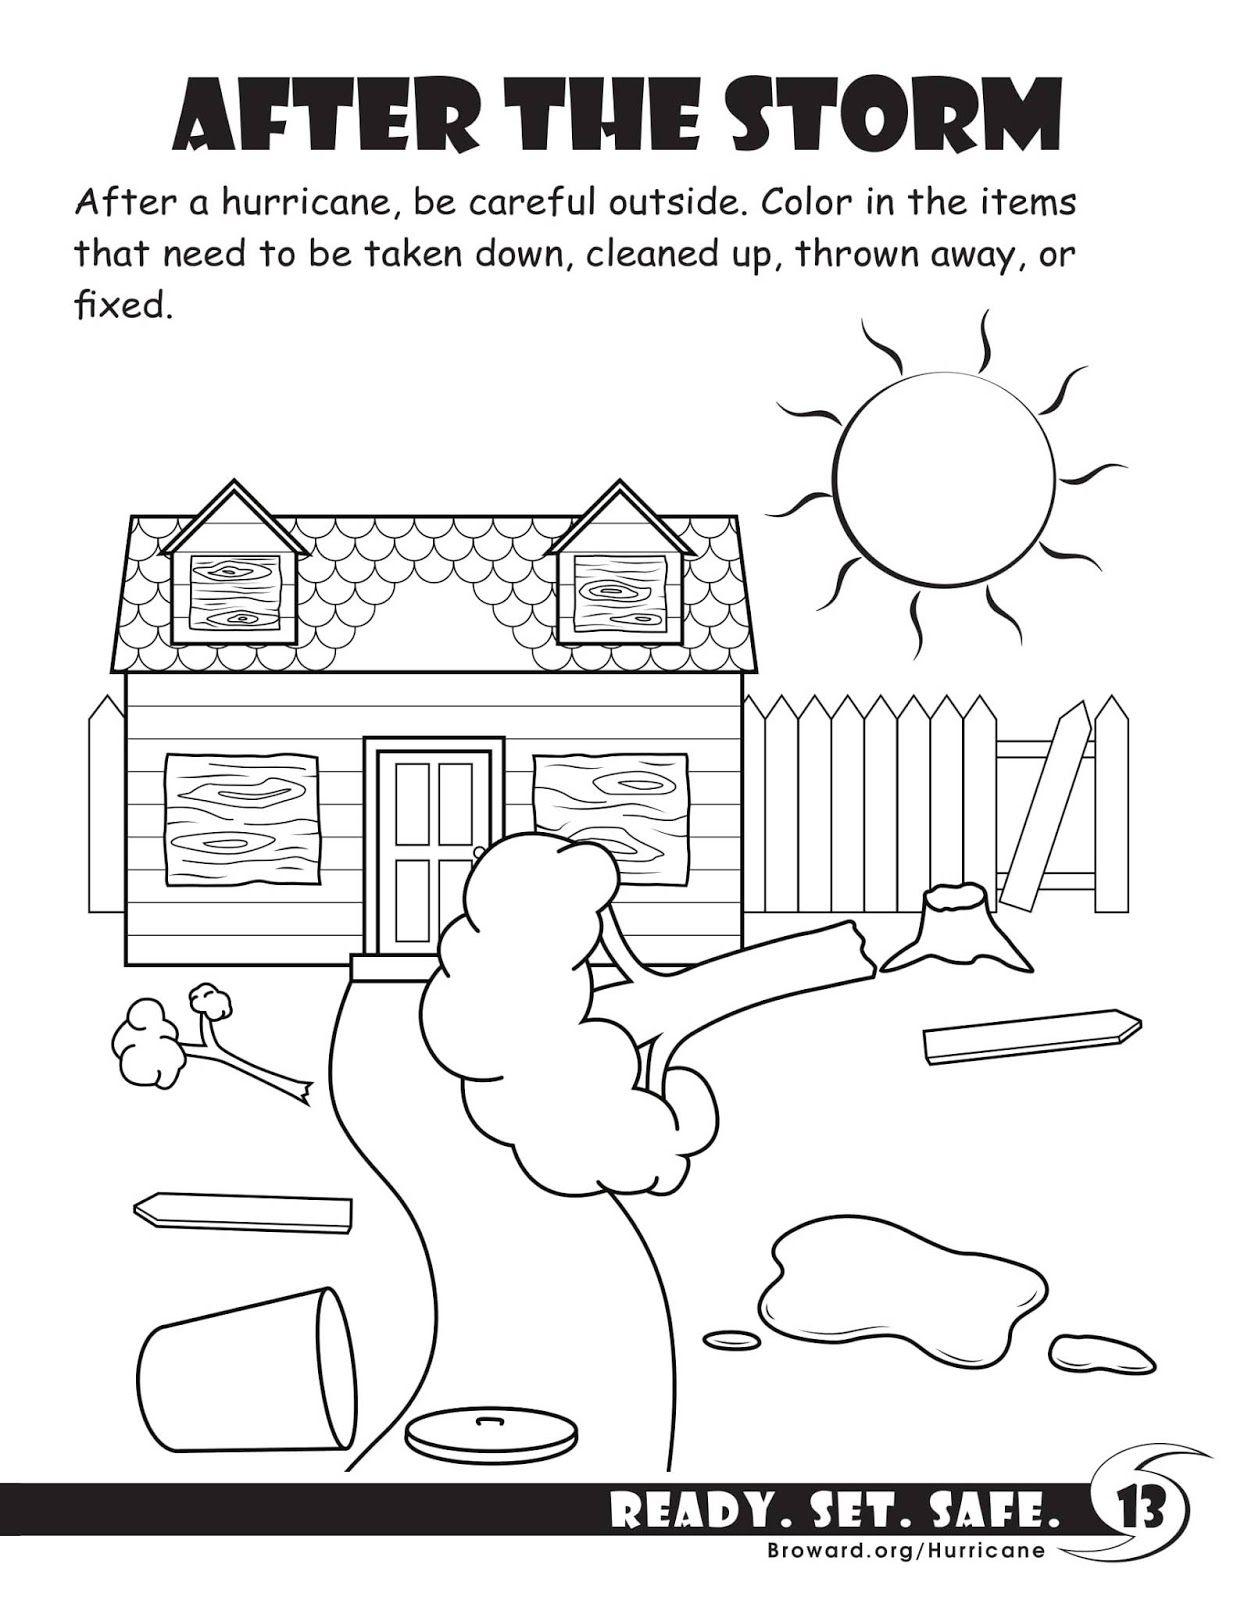 Hurricane Activity Book Click Photo More Activity Book Activity Book Coloring Book Fabr Hurricanes Activities Science Activities For Kids Book Activities